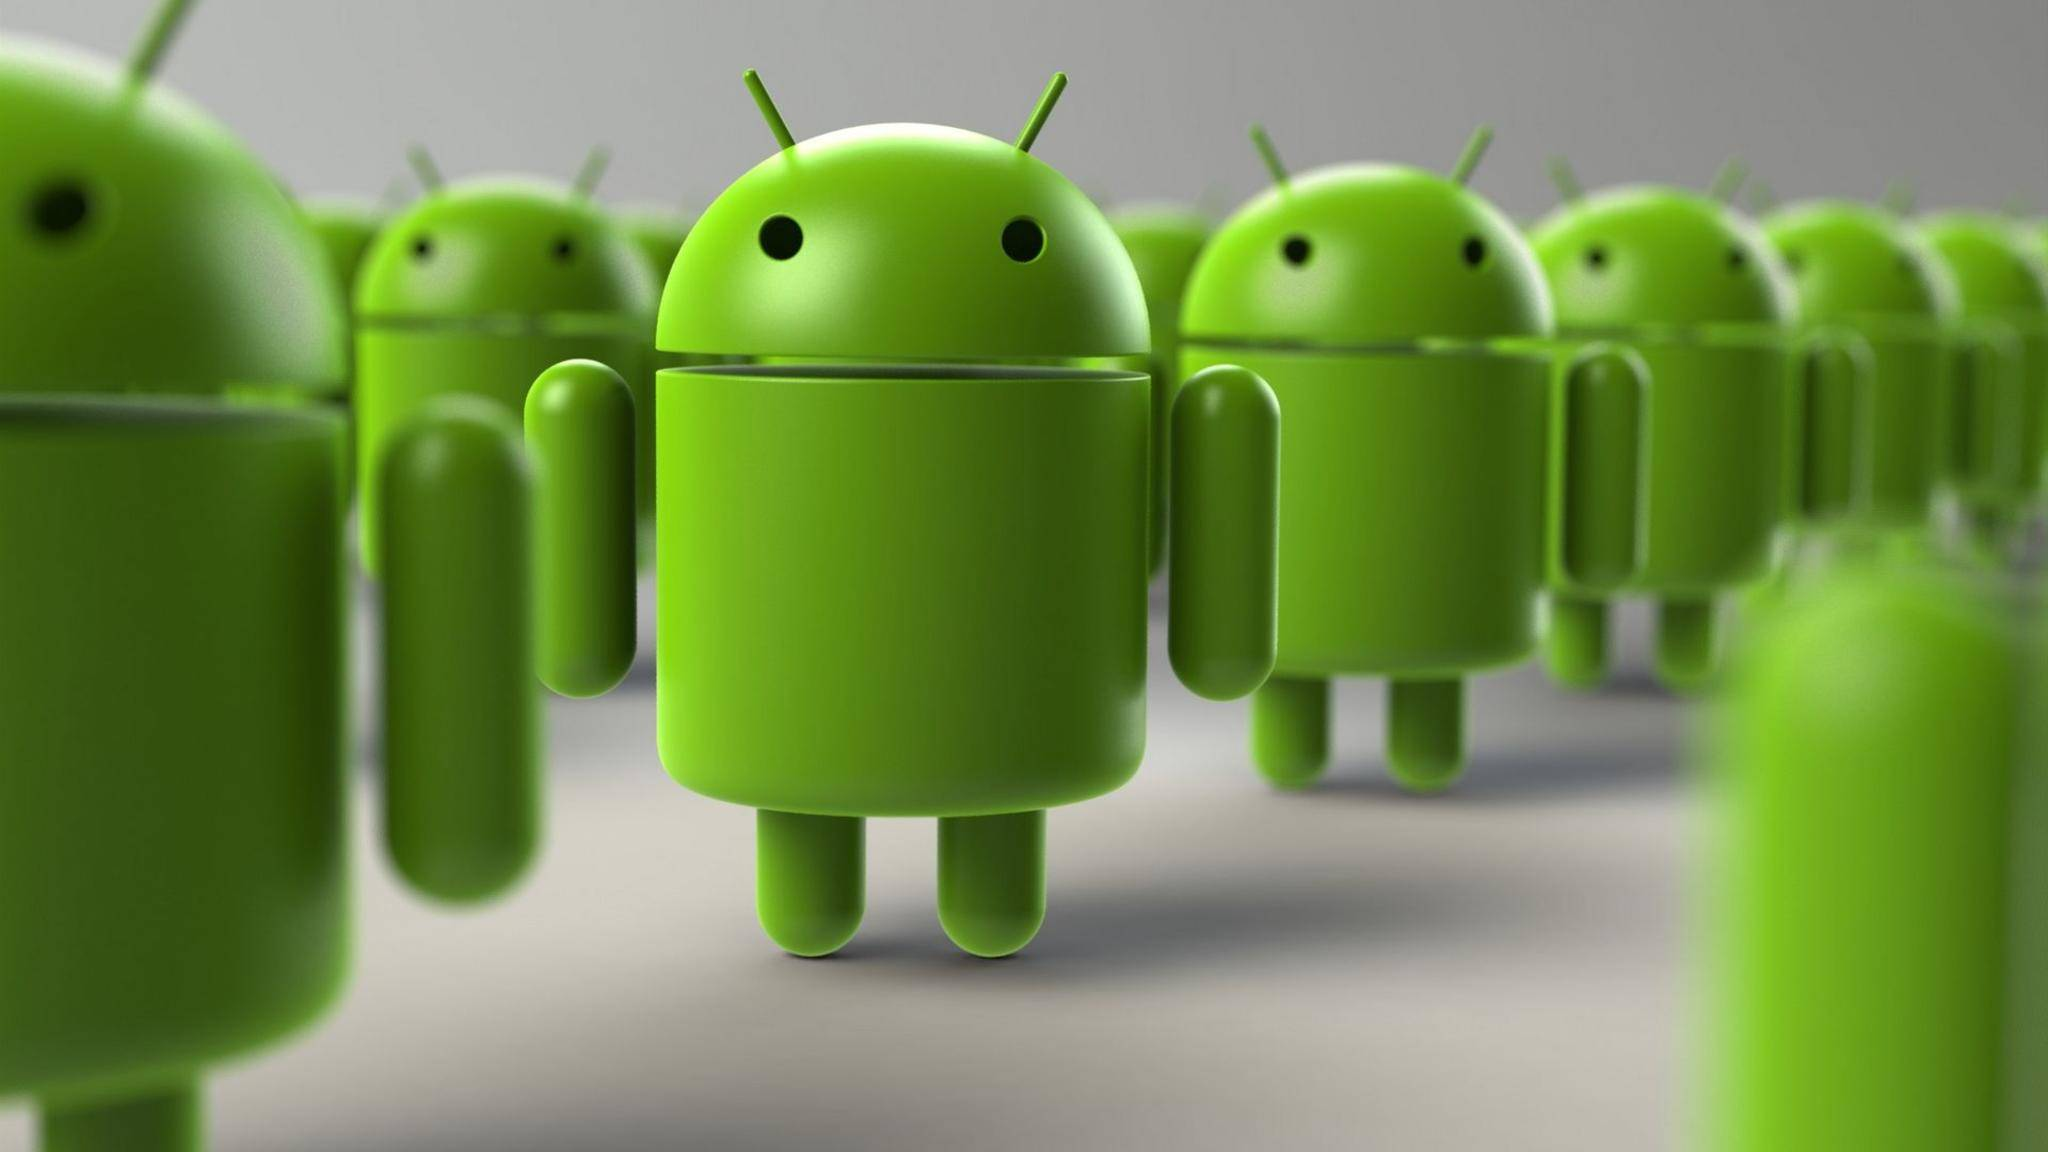 Android P soll Kamera- und Mikrofonspionage verhindern